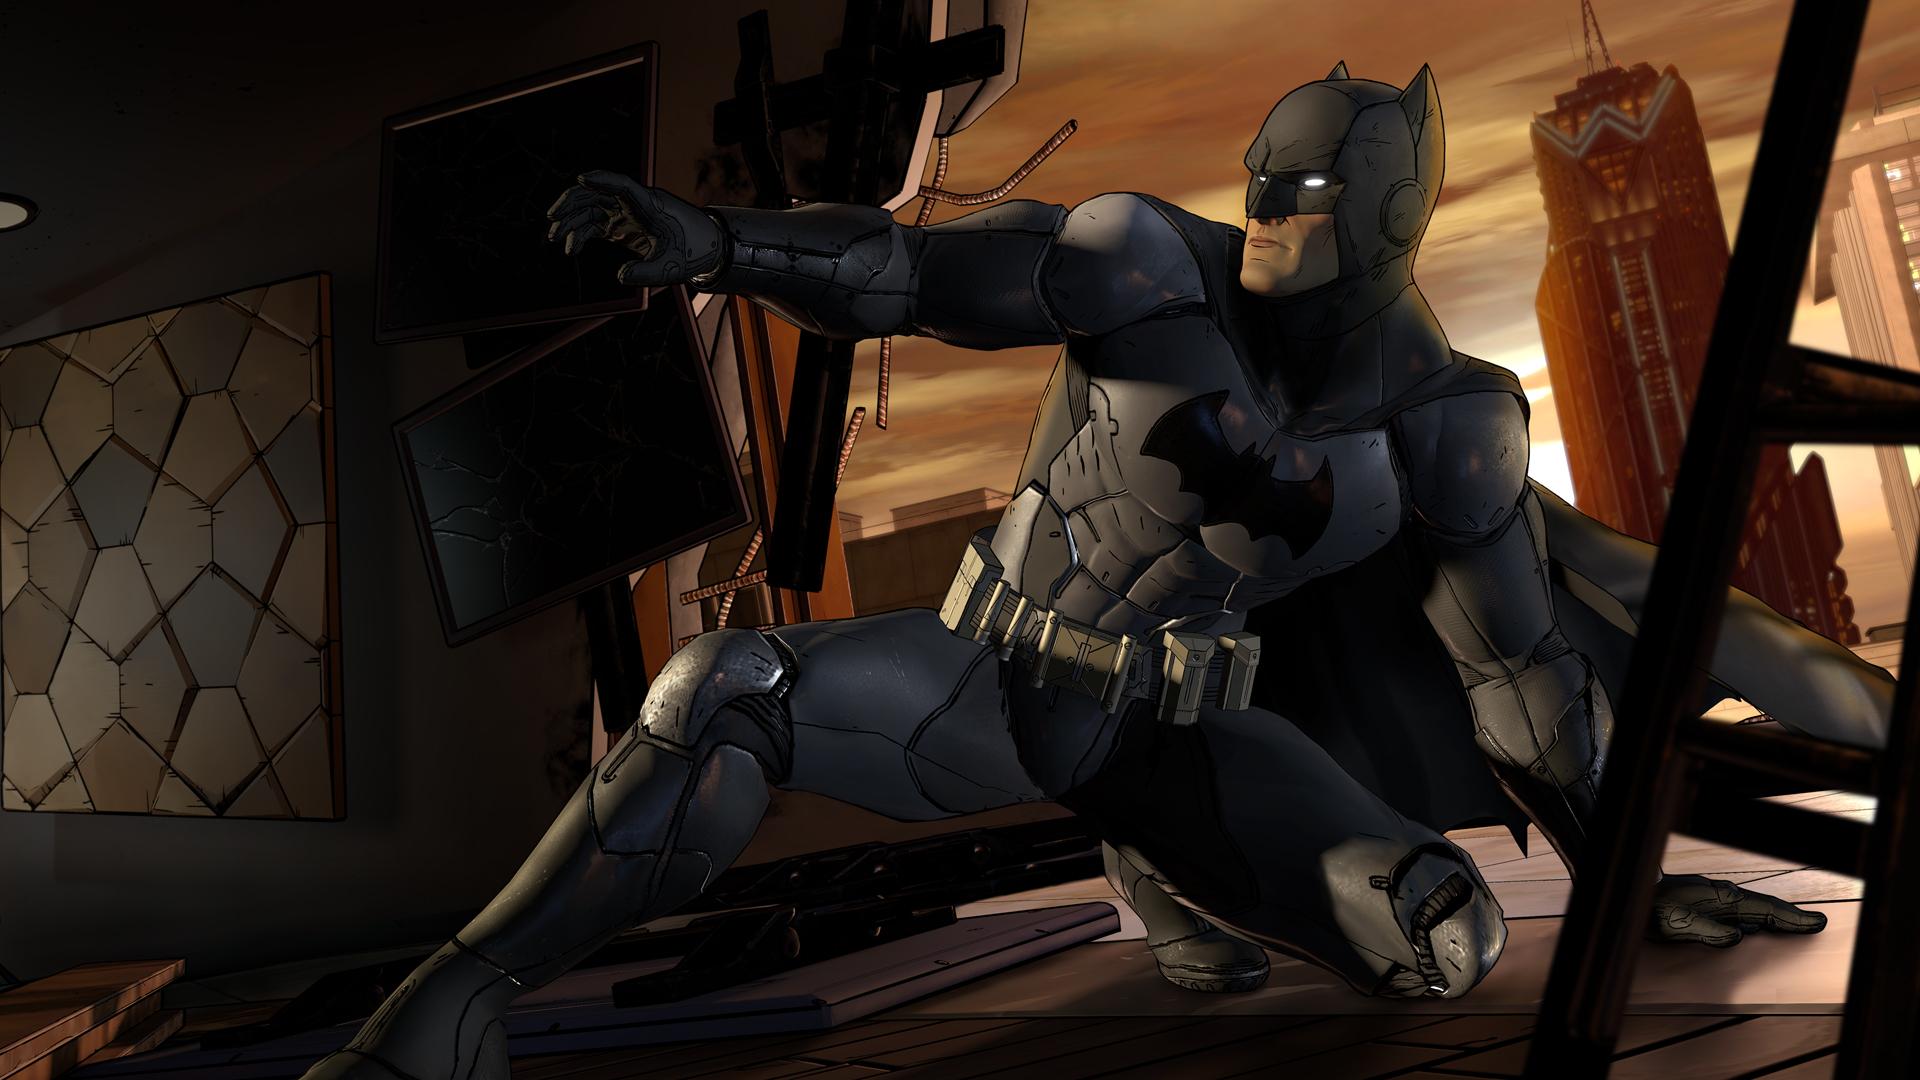 Telltale Batman's second episode goes into the Dark Knight's